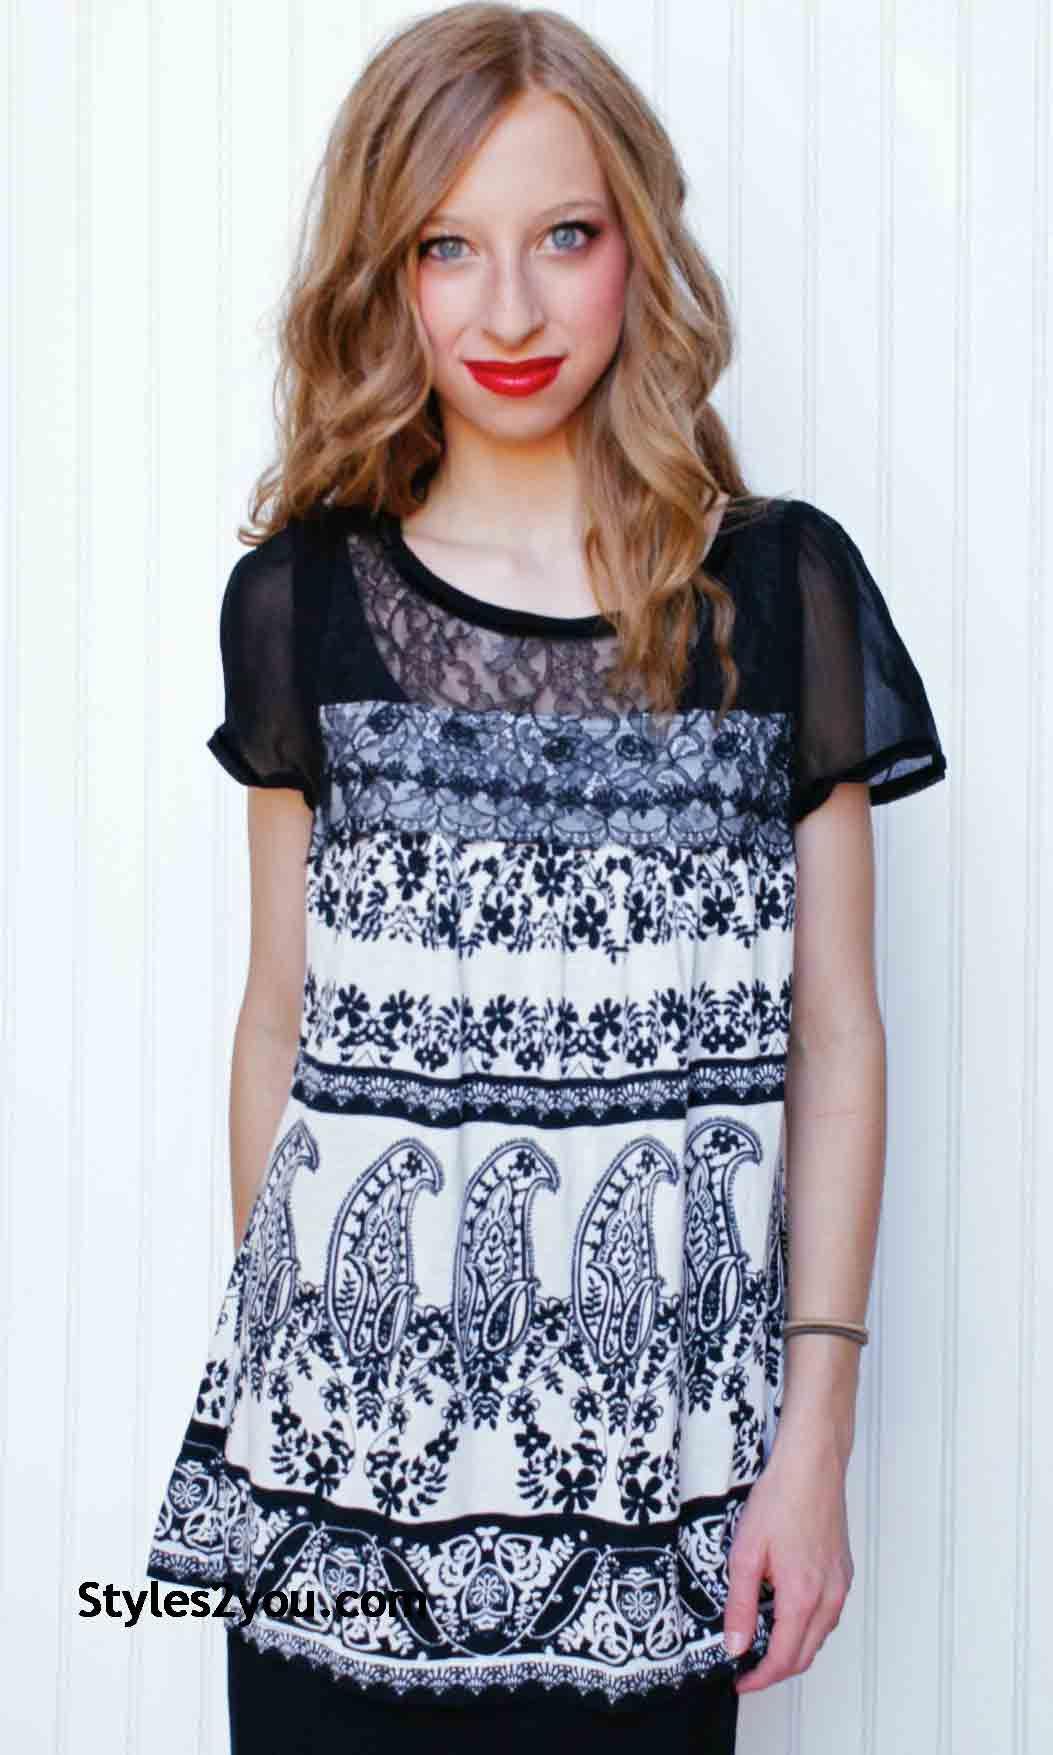 Vishalya Sleeveless Knit & Lace Blouse Black & White Bila Tops